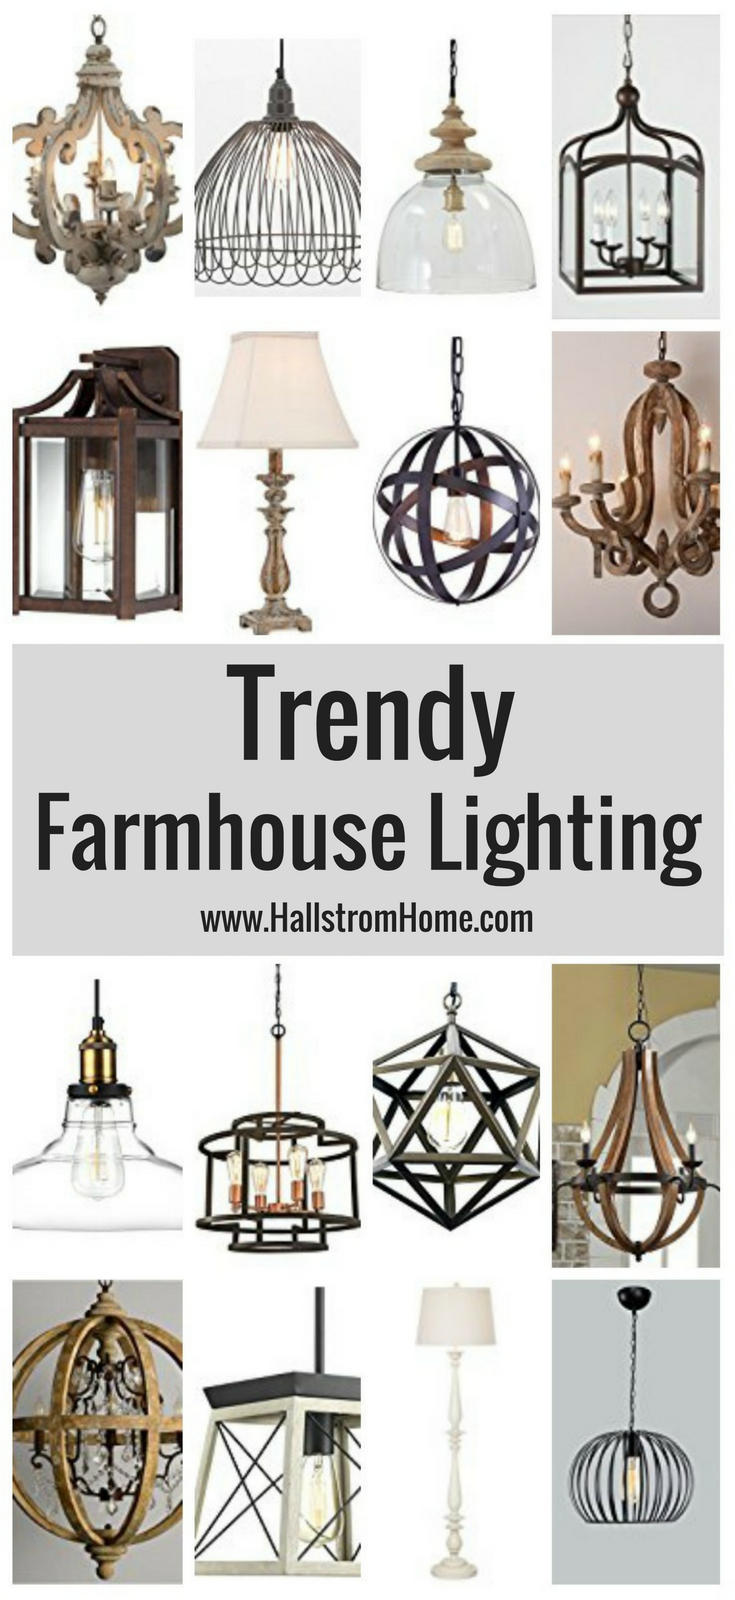 The Best Farmhouse Lighting On Amazon Hallstrom Home Farmhouse